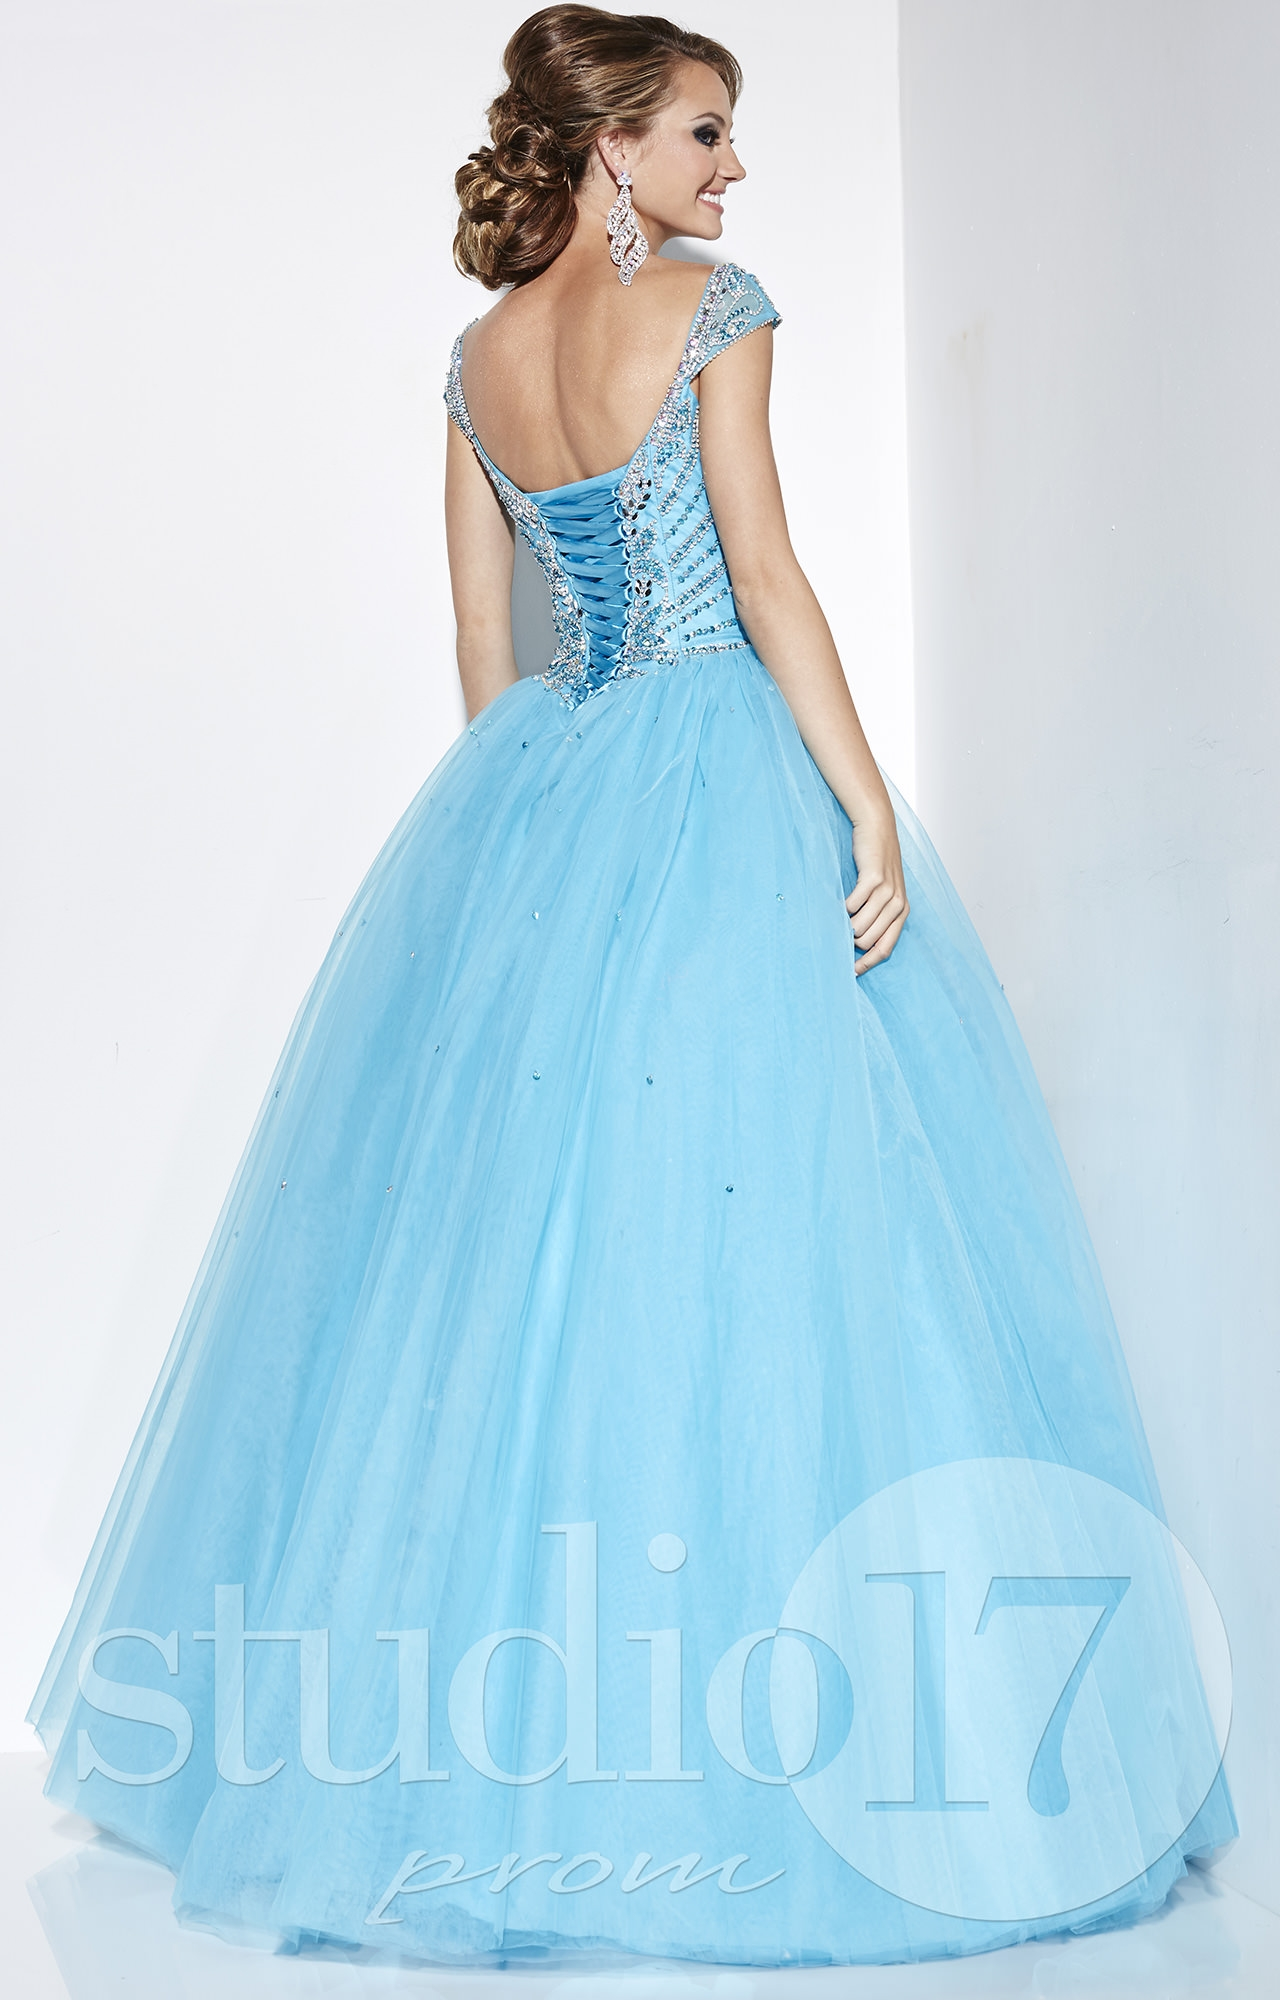 Studio 17 12589 - Cinderella Ball Gown Prom Dress